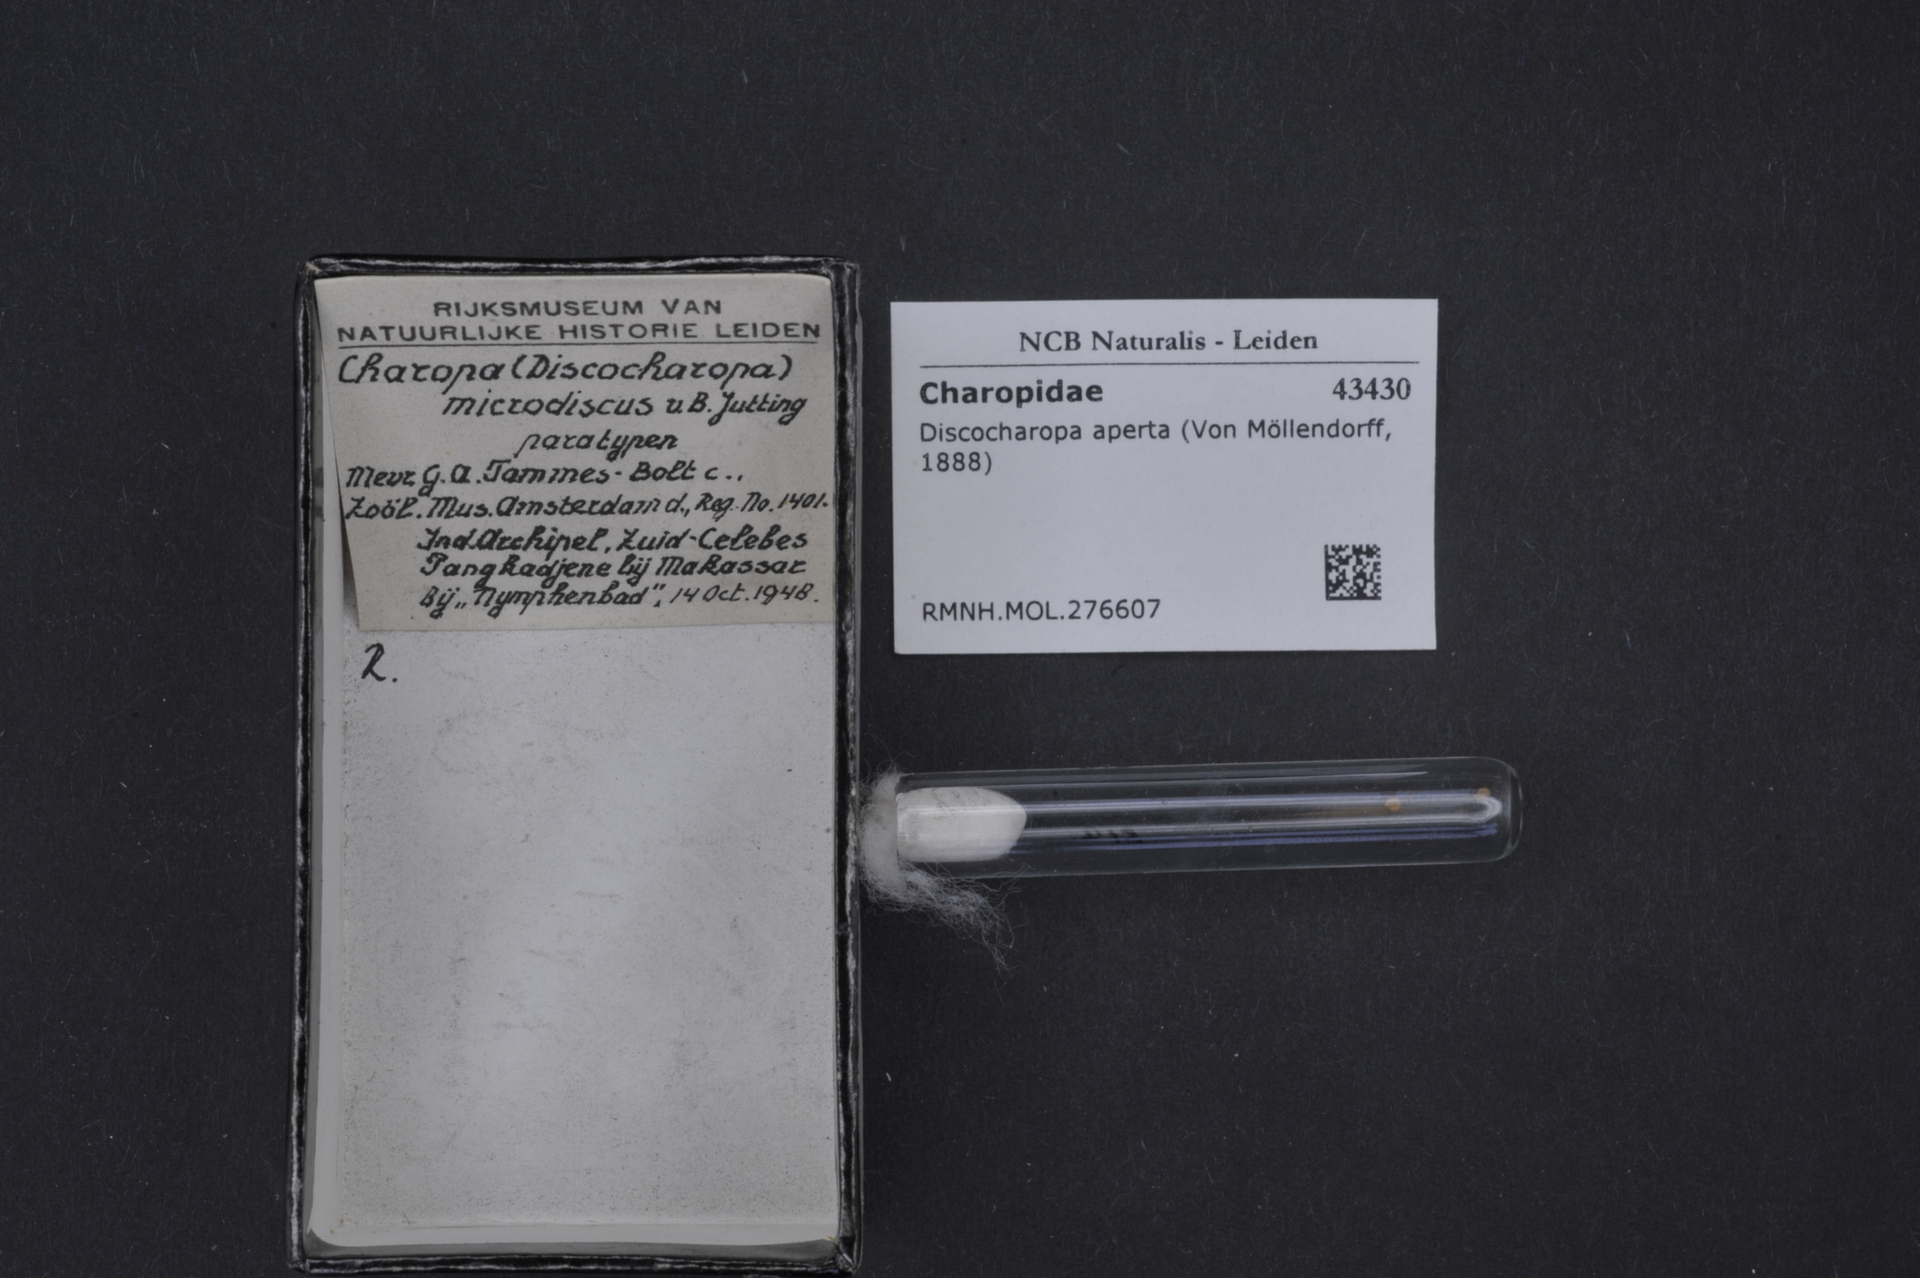 RMNH.MOL.276607 | Discocharopa aperta Von Möllendorff, 1888